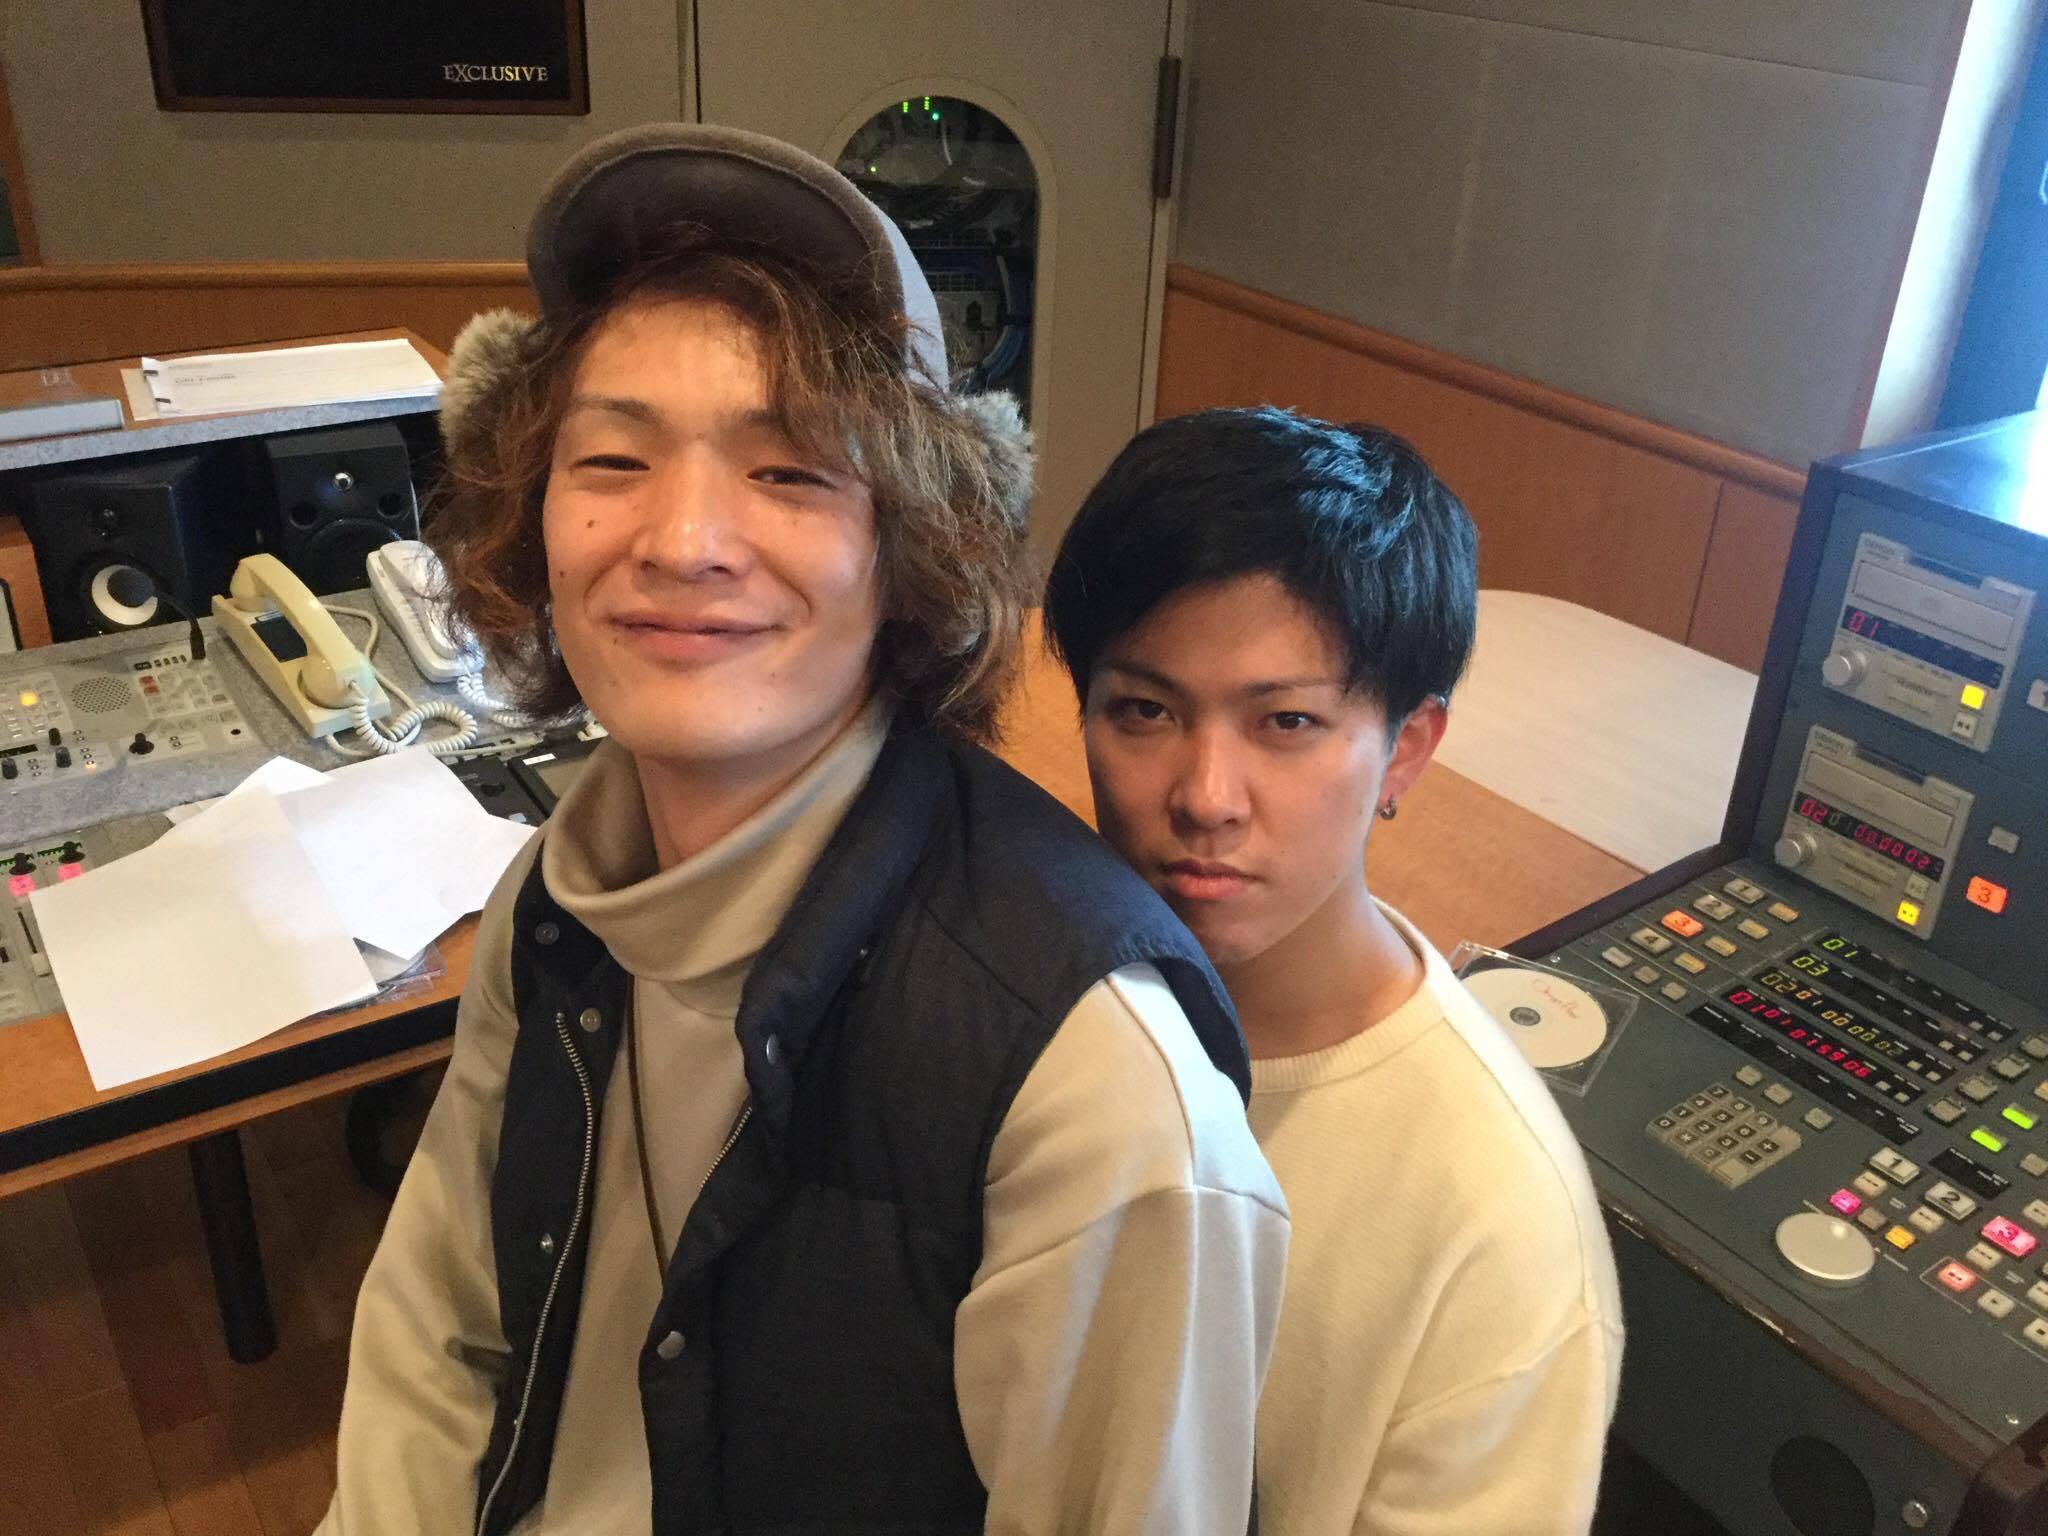 Sumika Orange Floor オレフロ847 Sumika Inc Fmヨコハマ Tresen